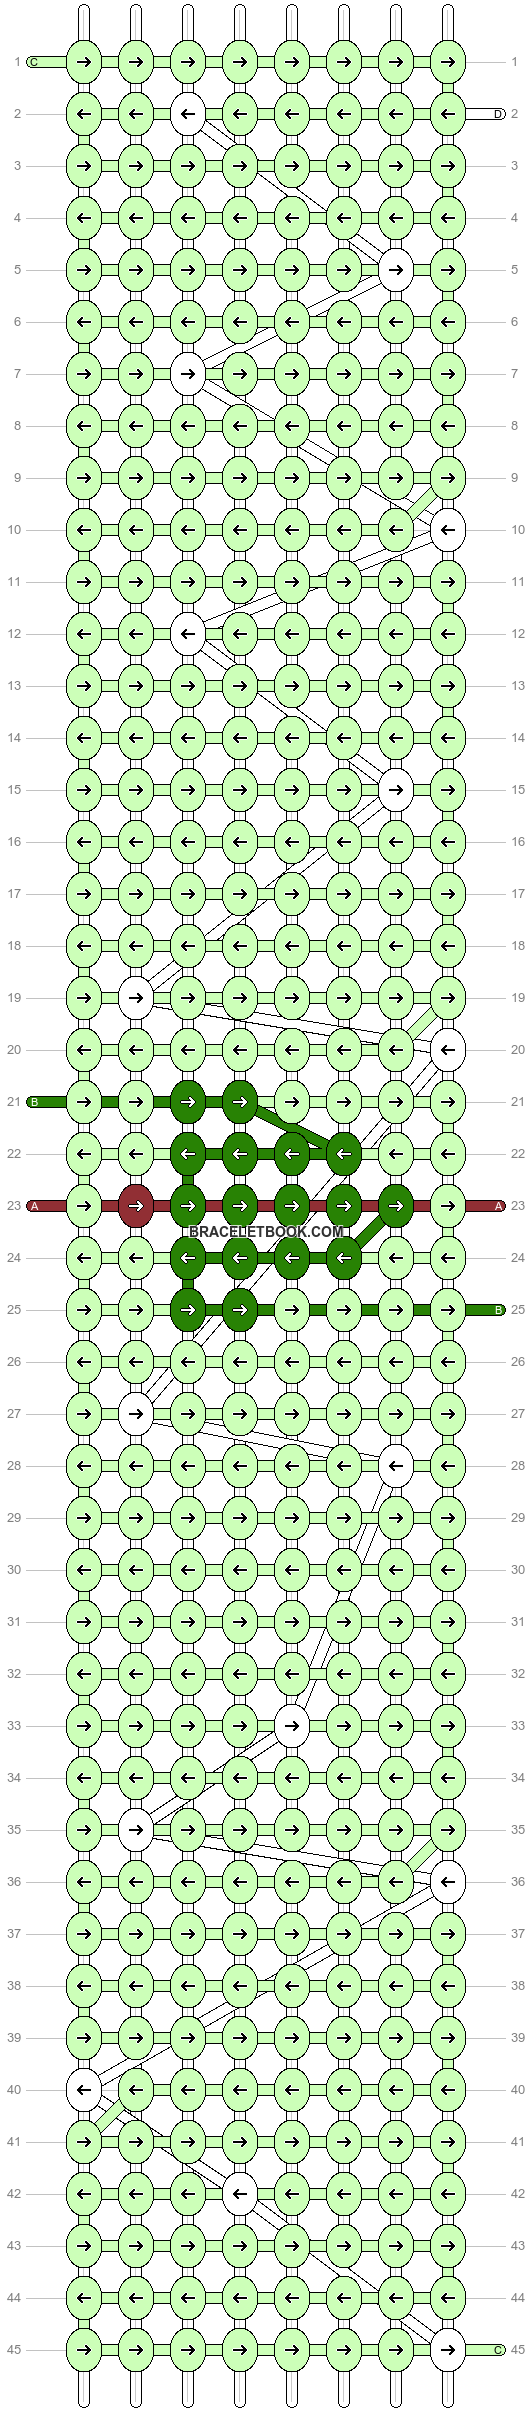 Alpha pattern #102338 pattern